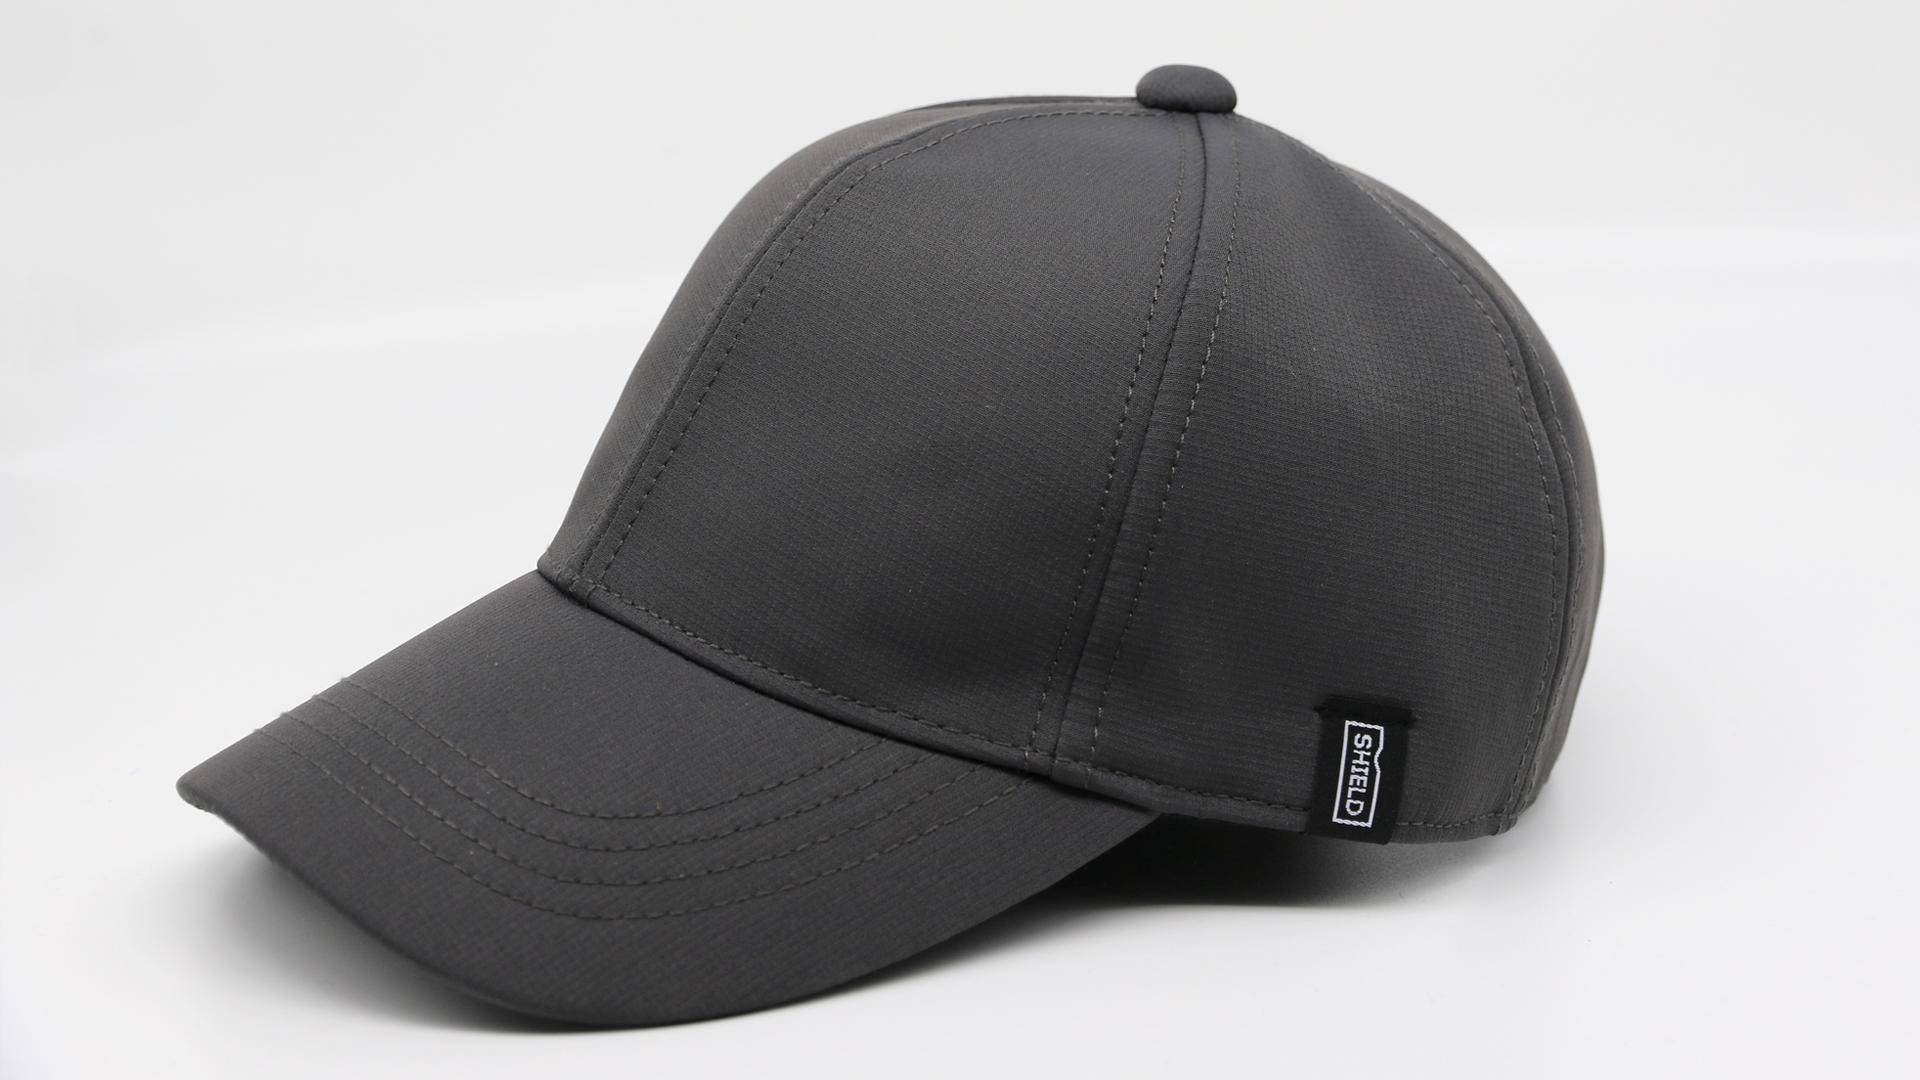 EMF Protective Casual Baseball Cap